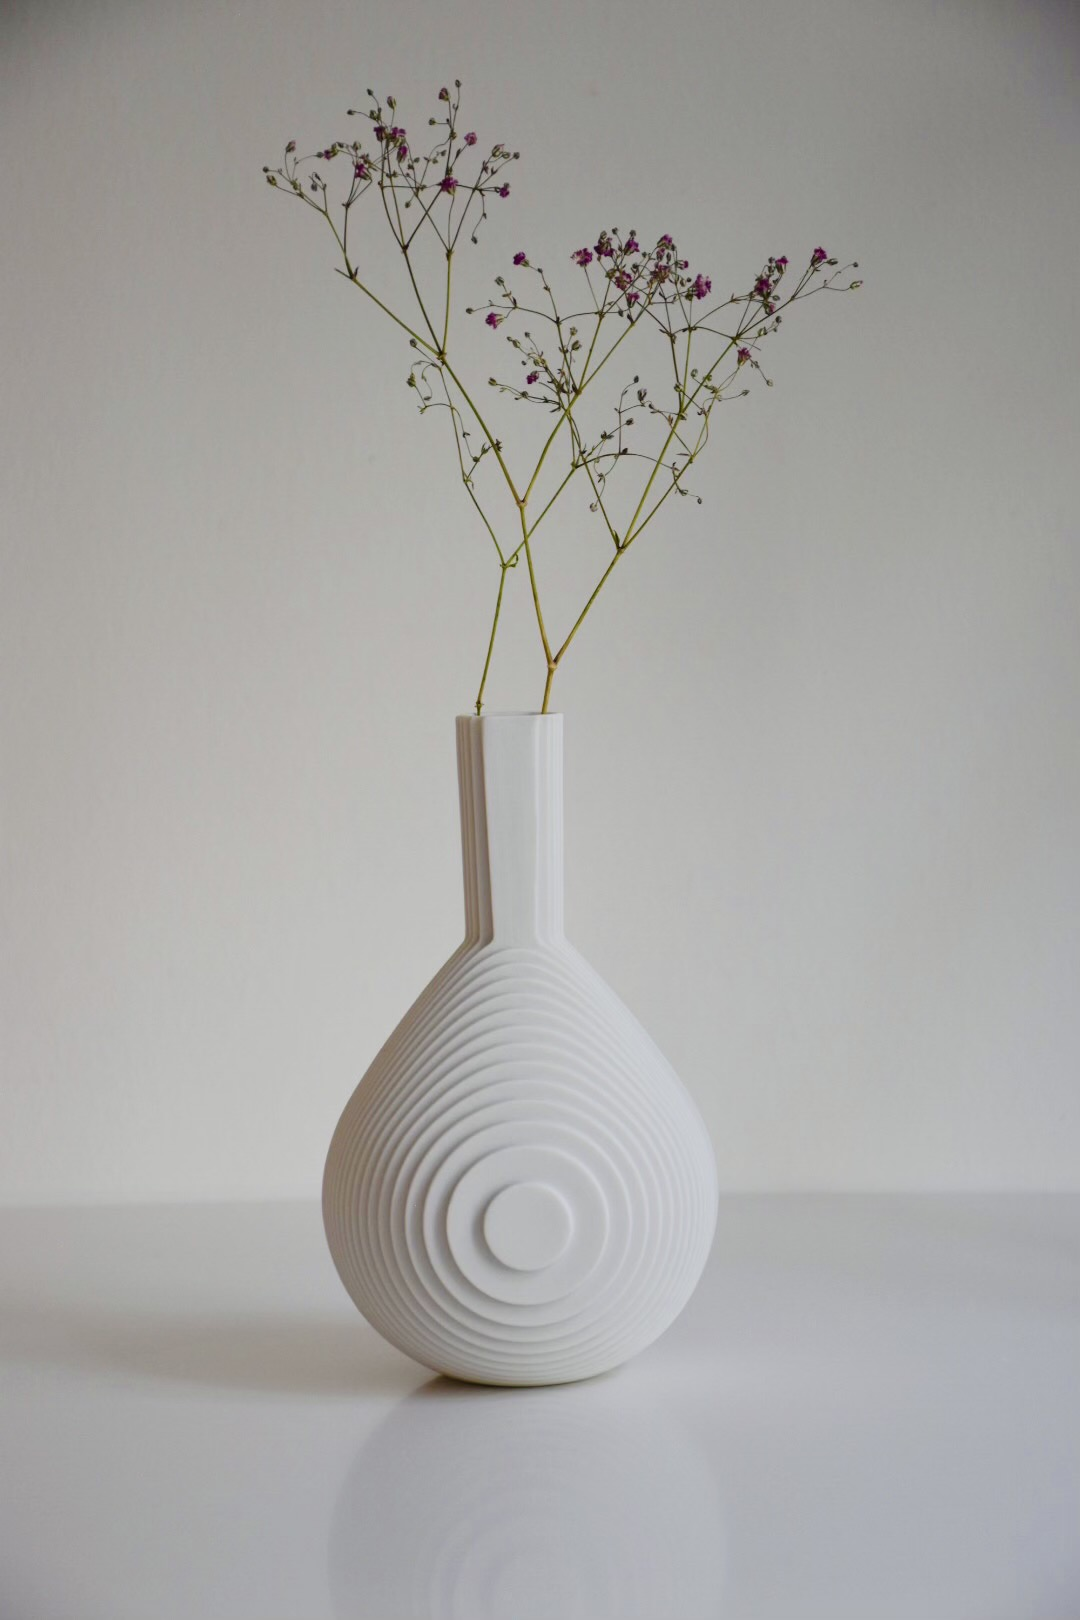 Architectmade-Flow-Drop-Porcelain-Denmark-Vibeke-Rytter